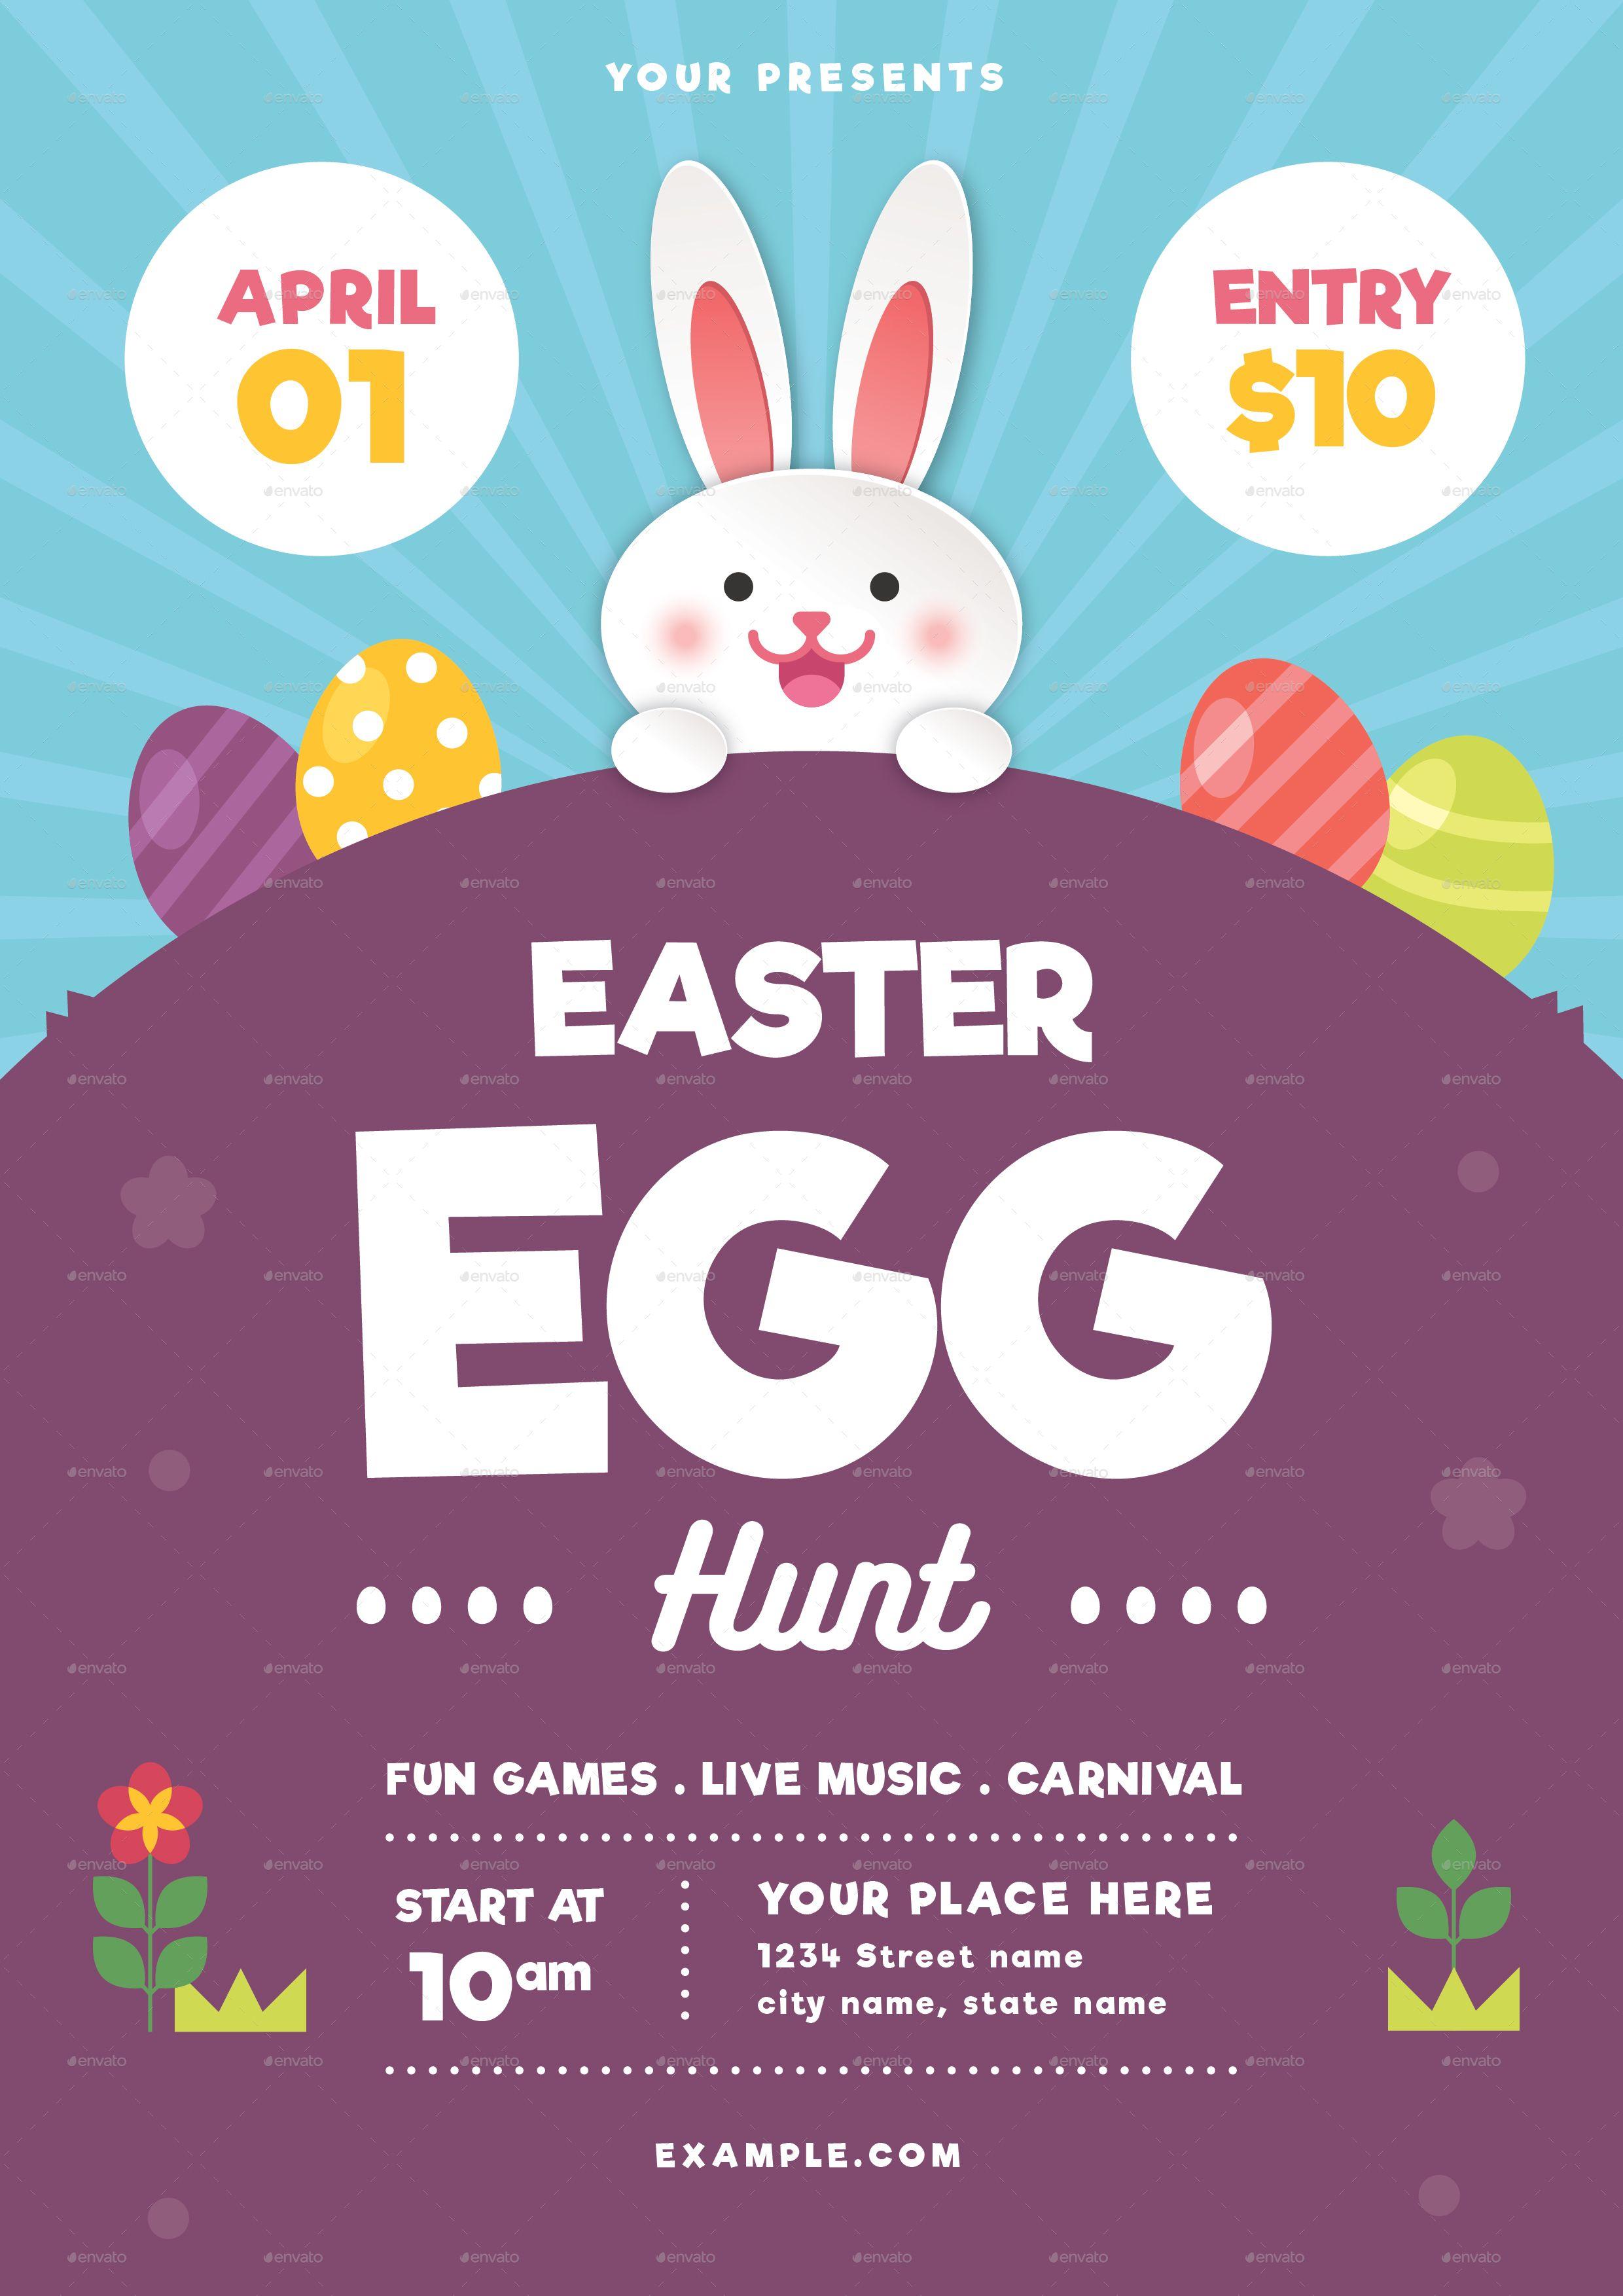 Easter Egg Hunt Flyer Template from i.pinimg.com